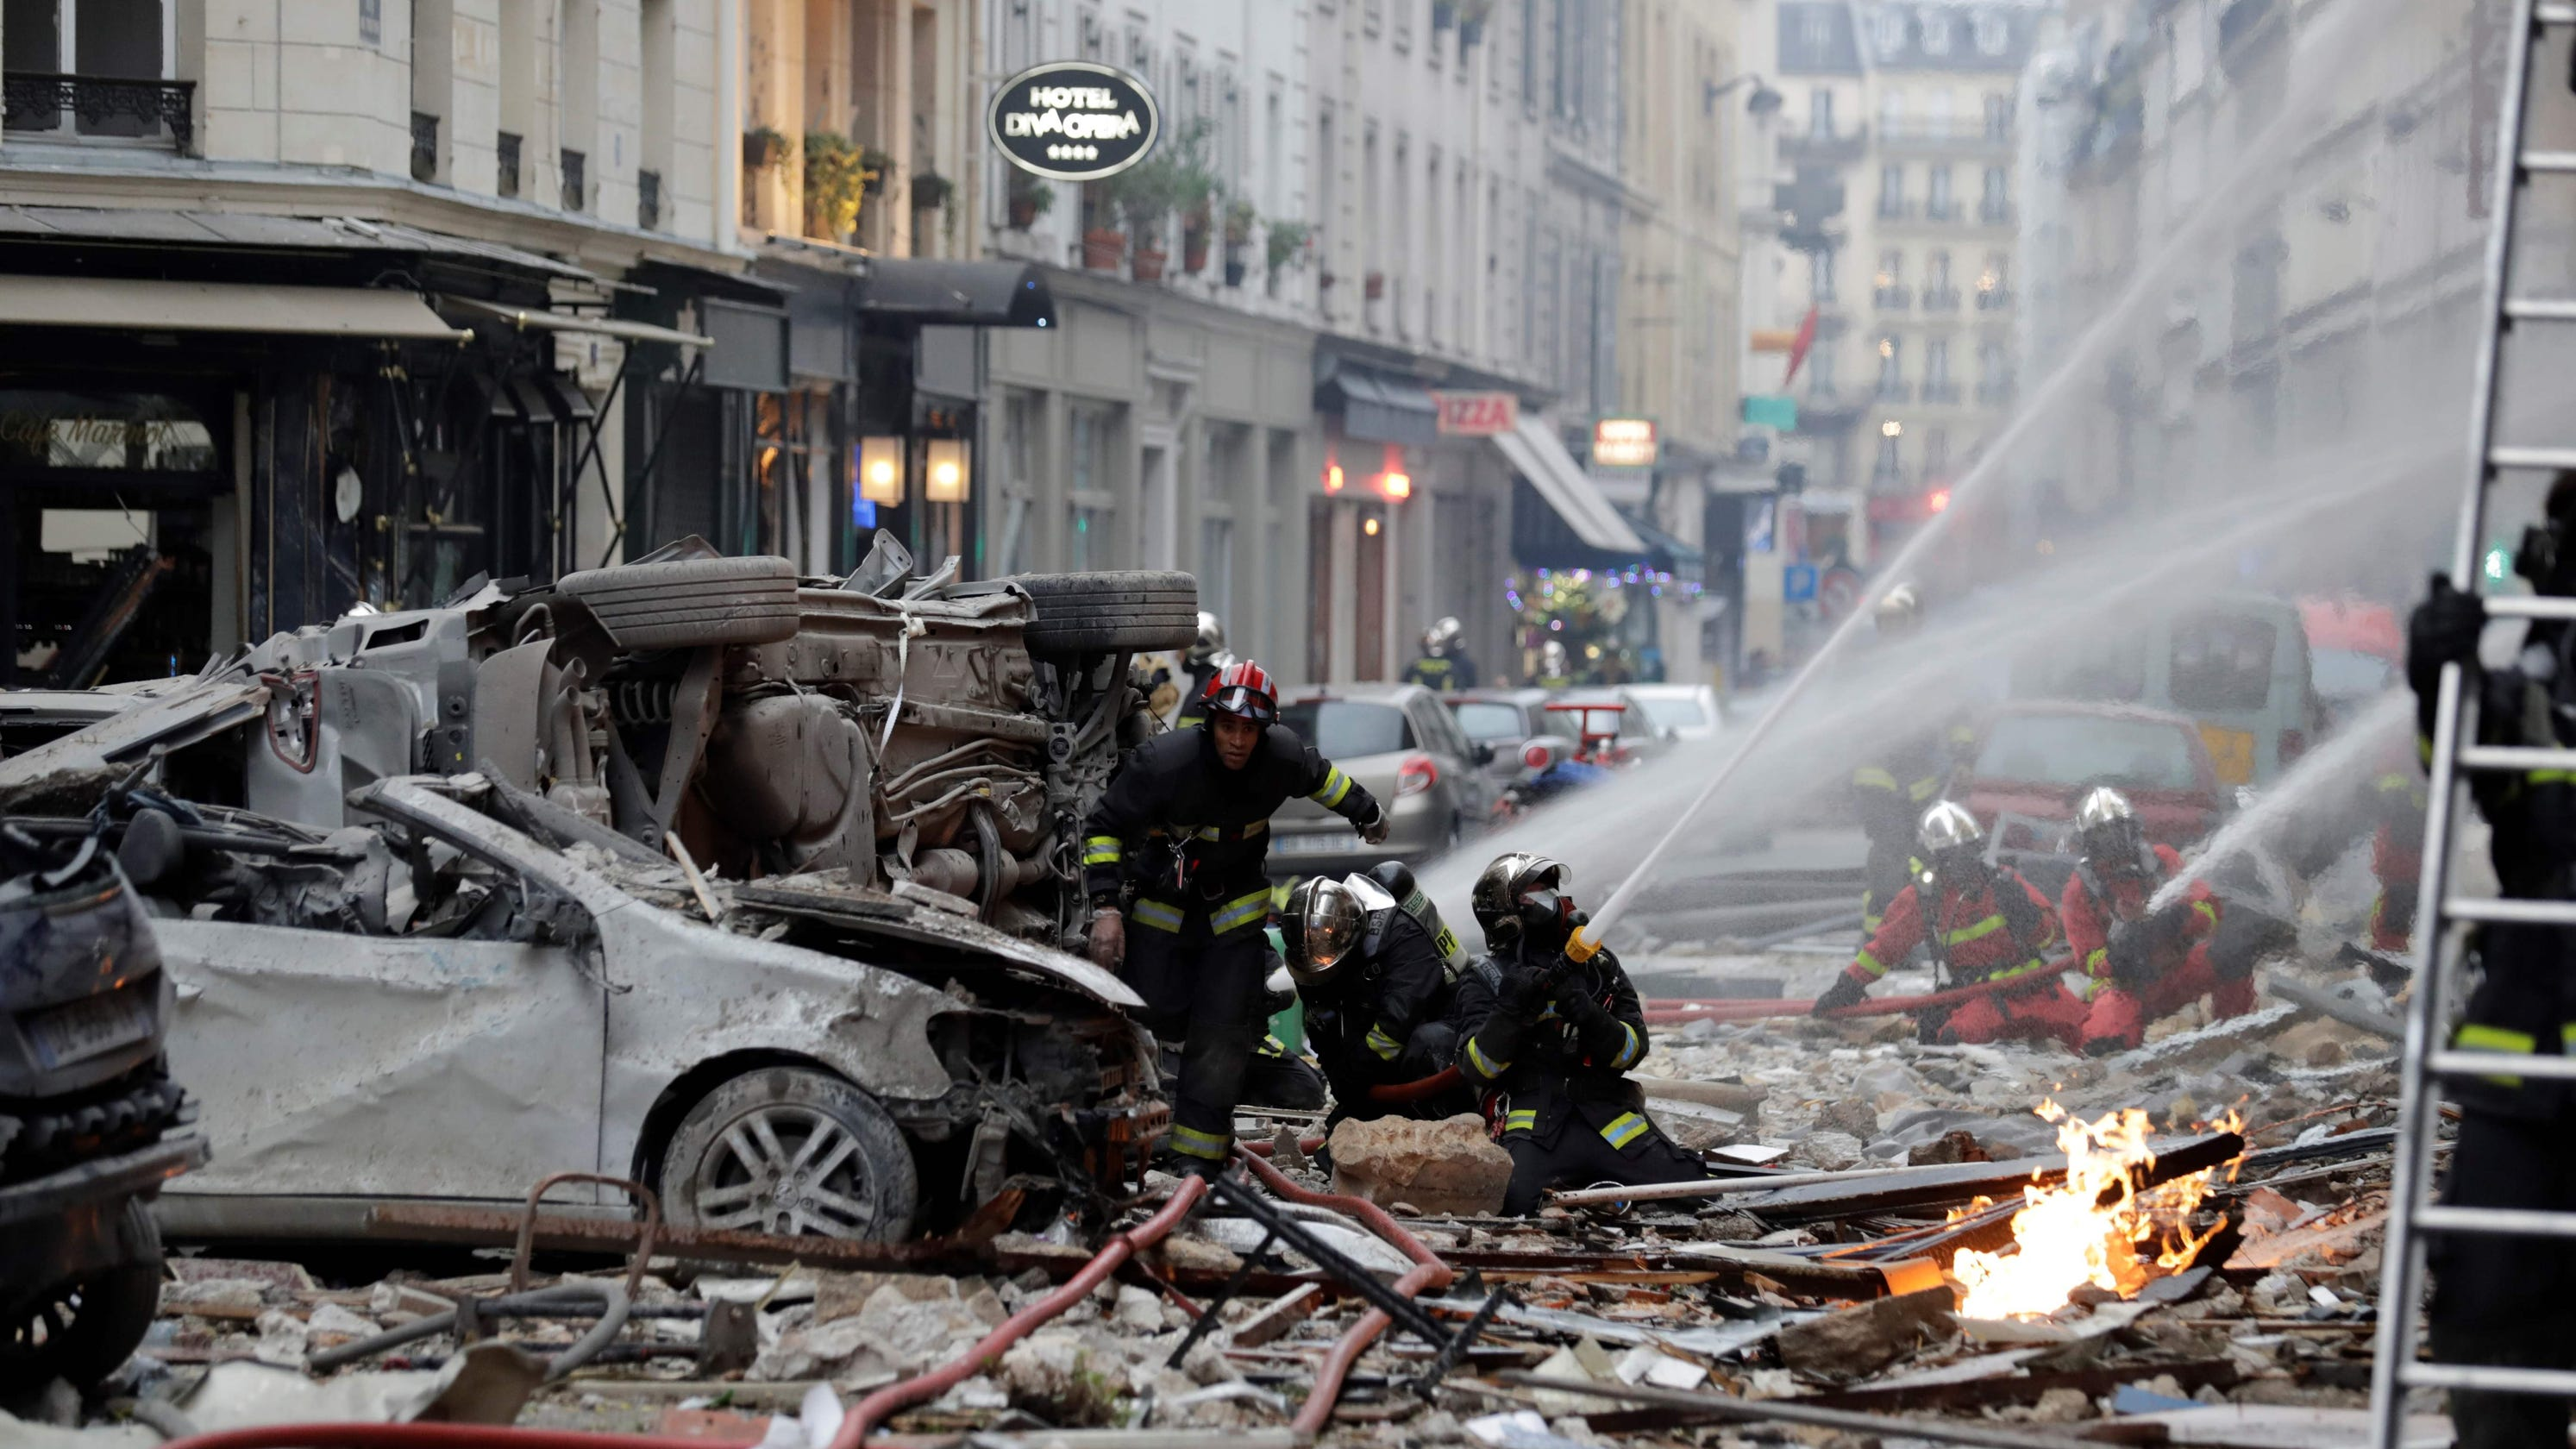 paris bakery explosion 2 firefighters dead 47 injured. Black Bedroom Furniture Sets. Home Design Ideas